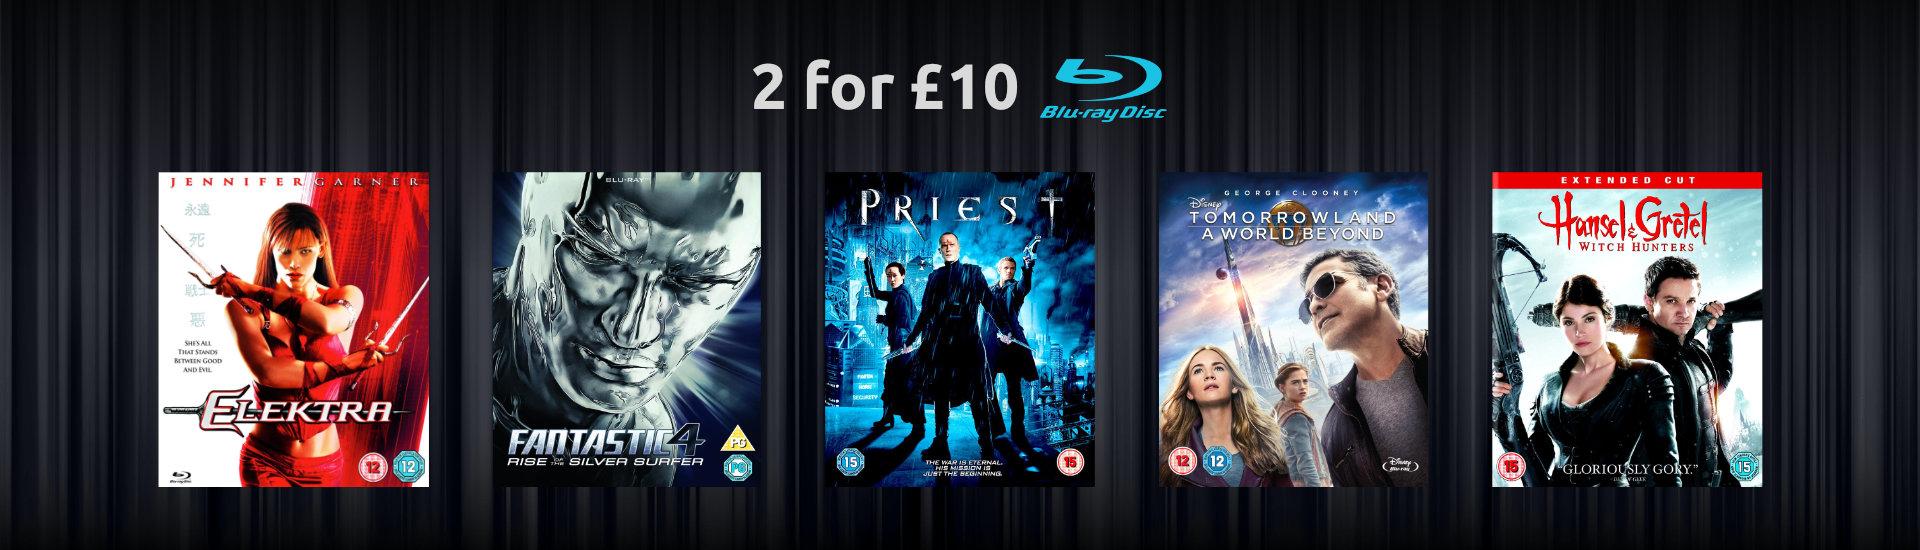 2 for £10 Fantasy